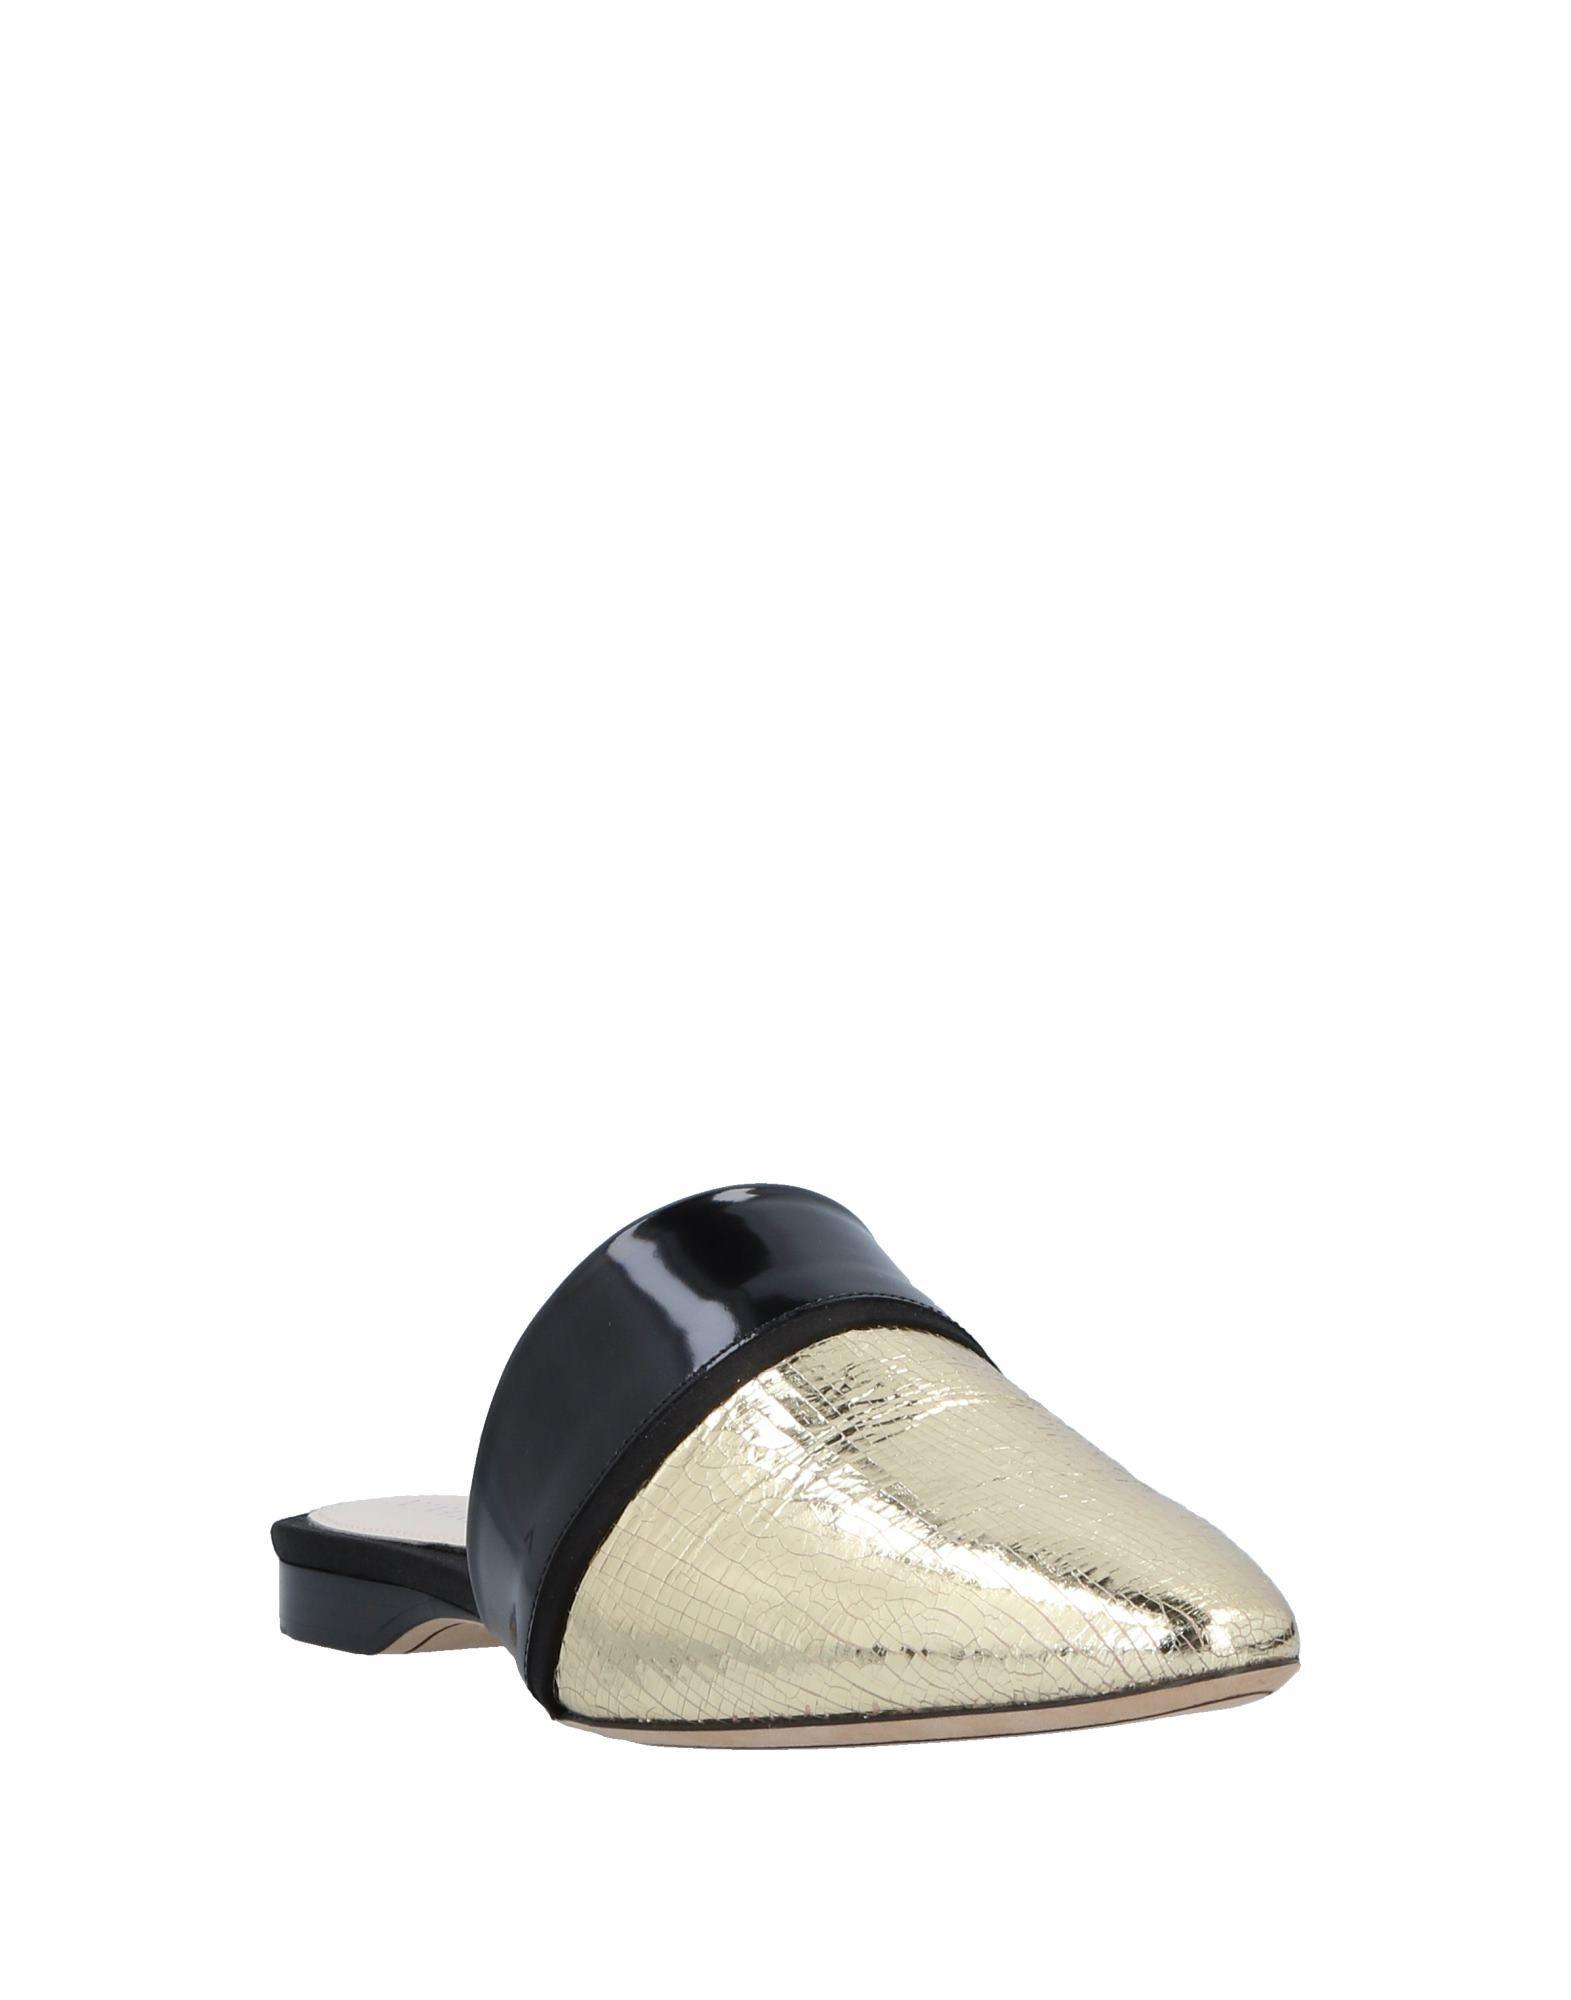 Rabatt Schuhe Nina Ricci  Pantoletten Damen  Ricci 11521331NL 63d237